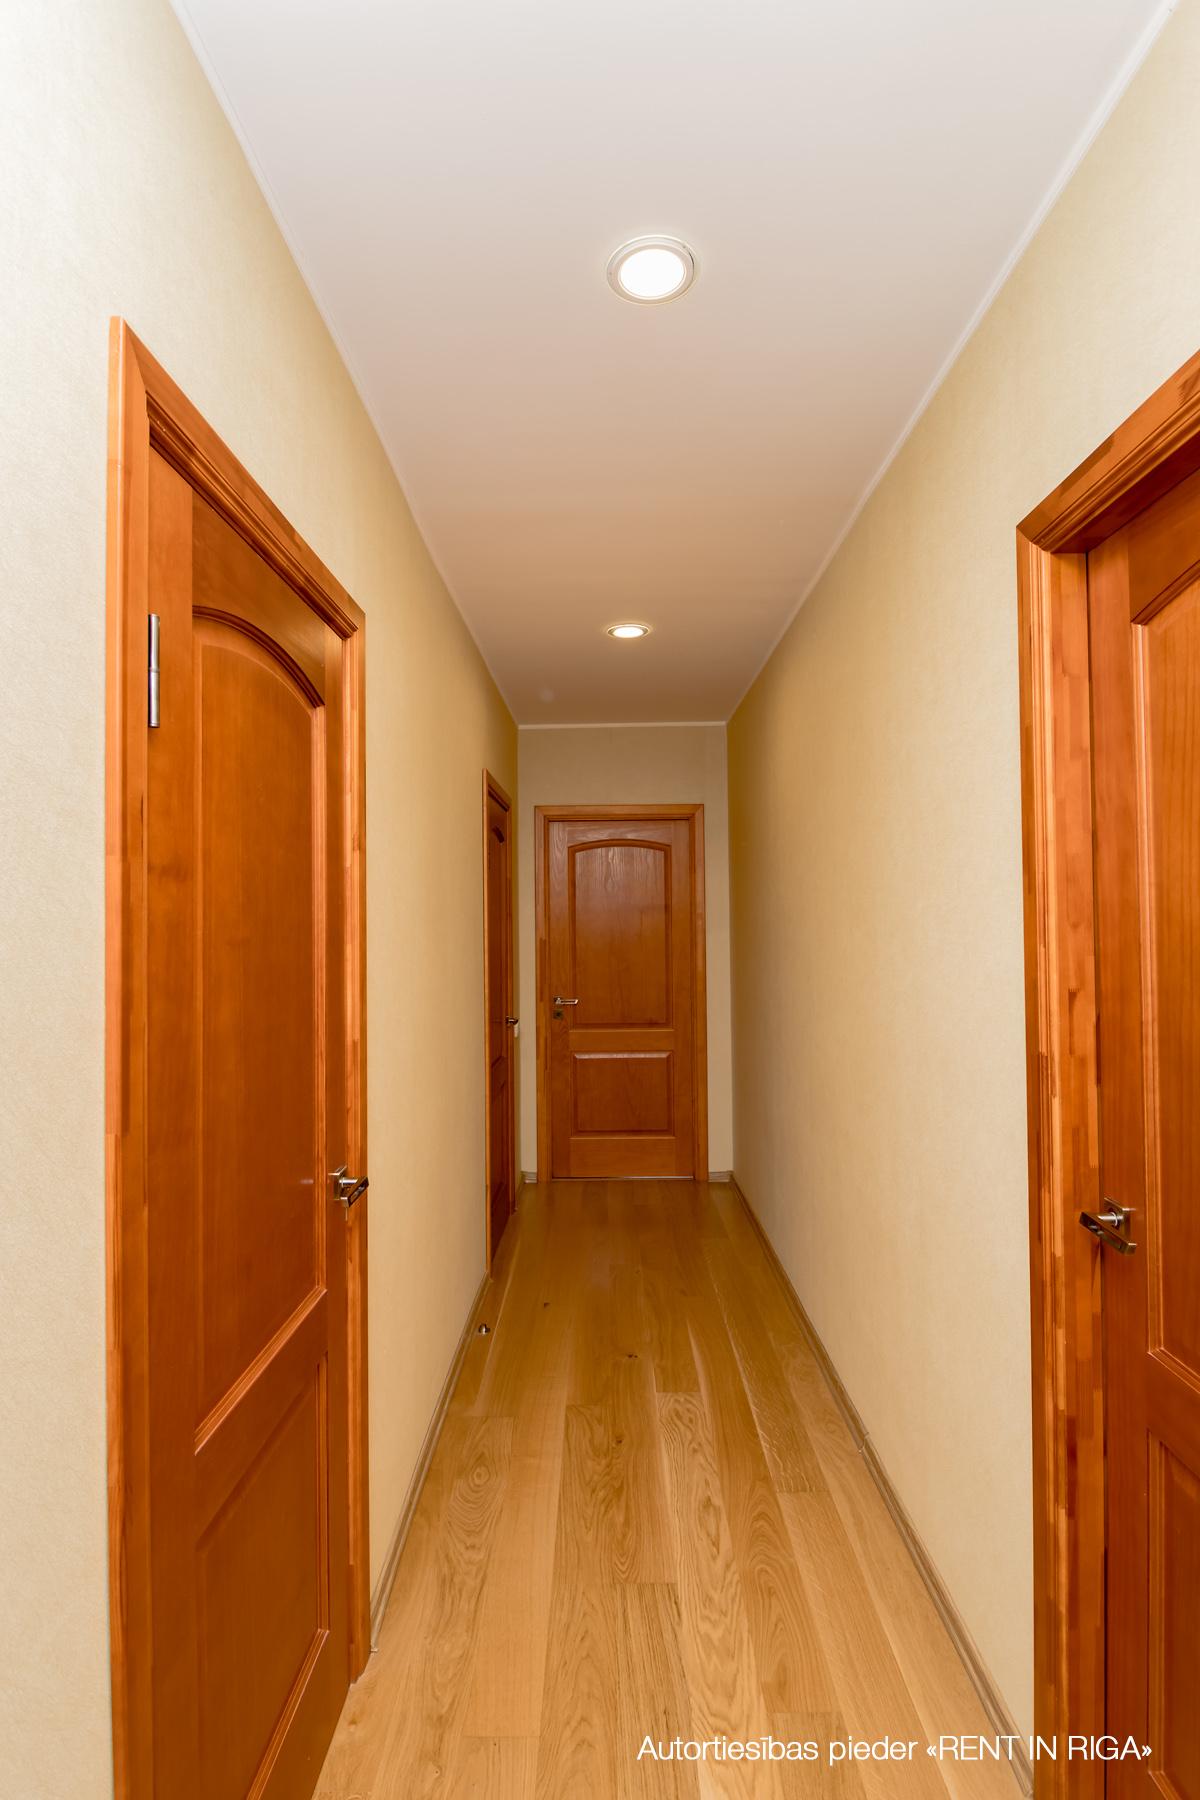 Pārdod māju, Kalmju iela - Attēls 1